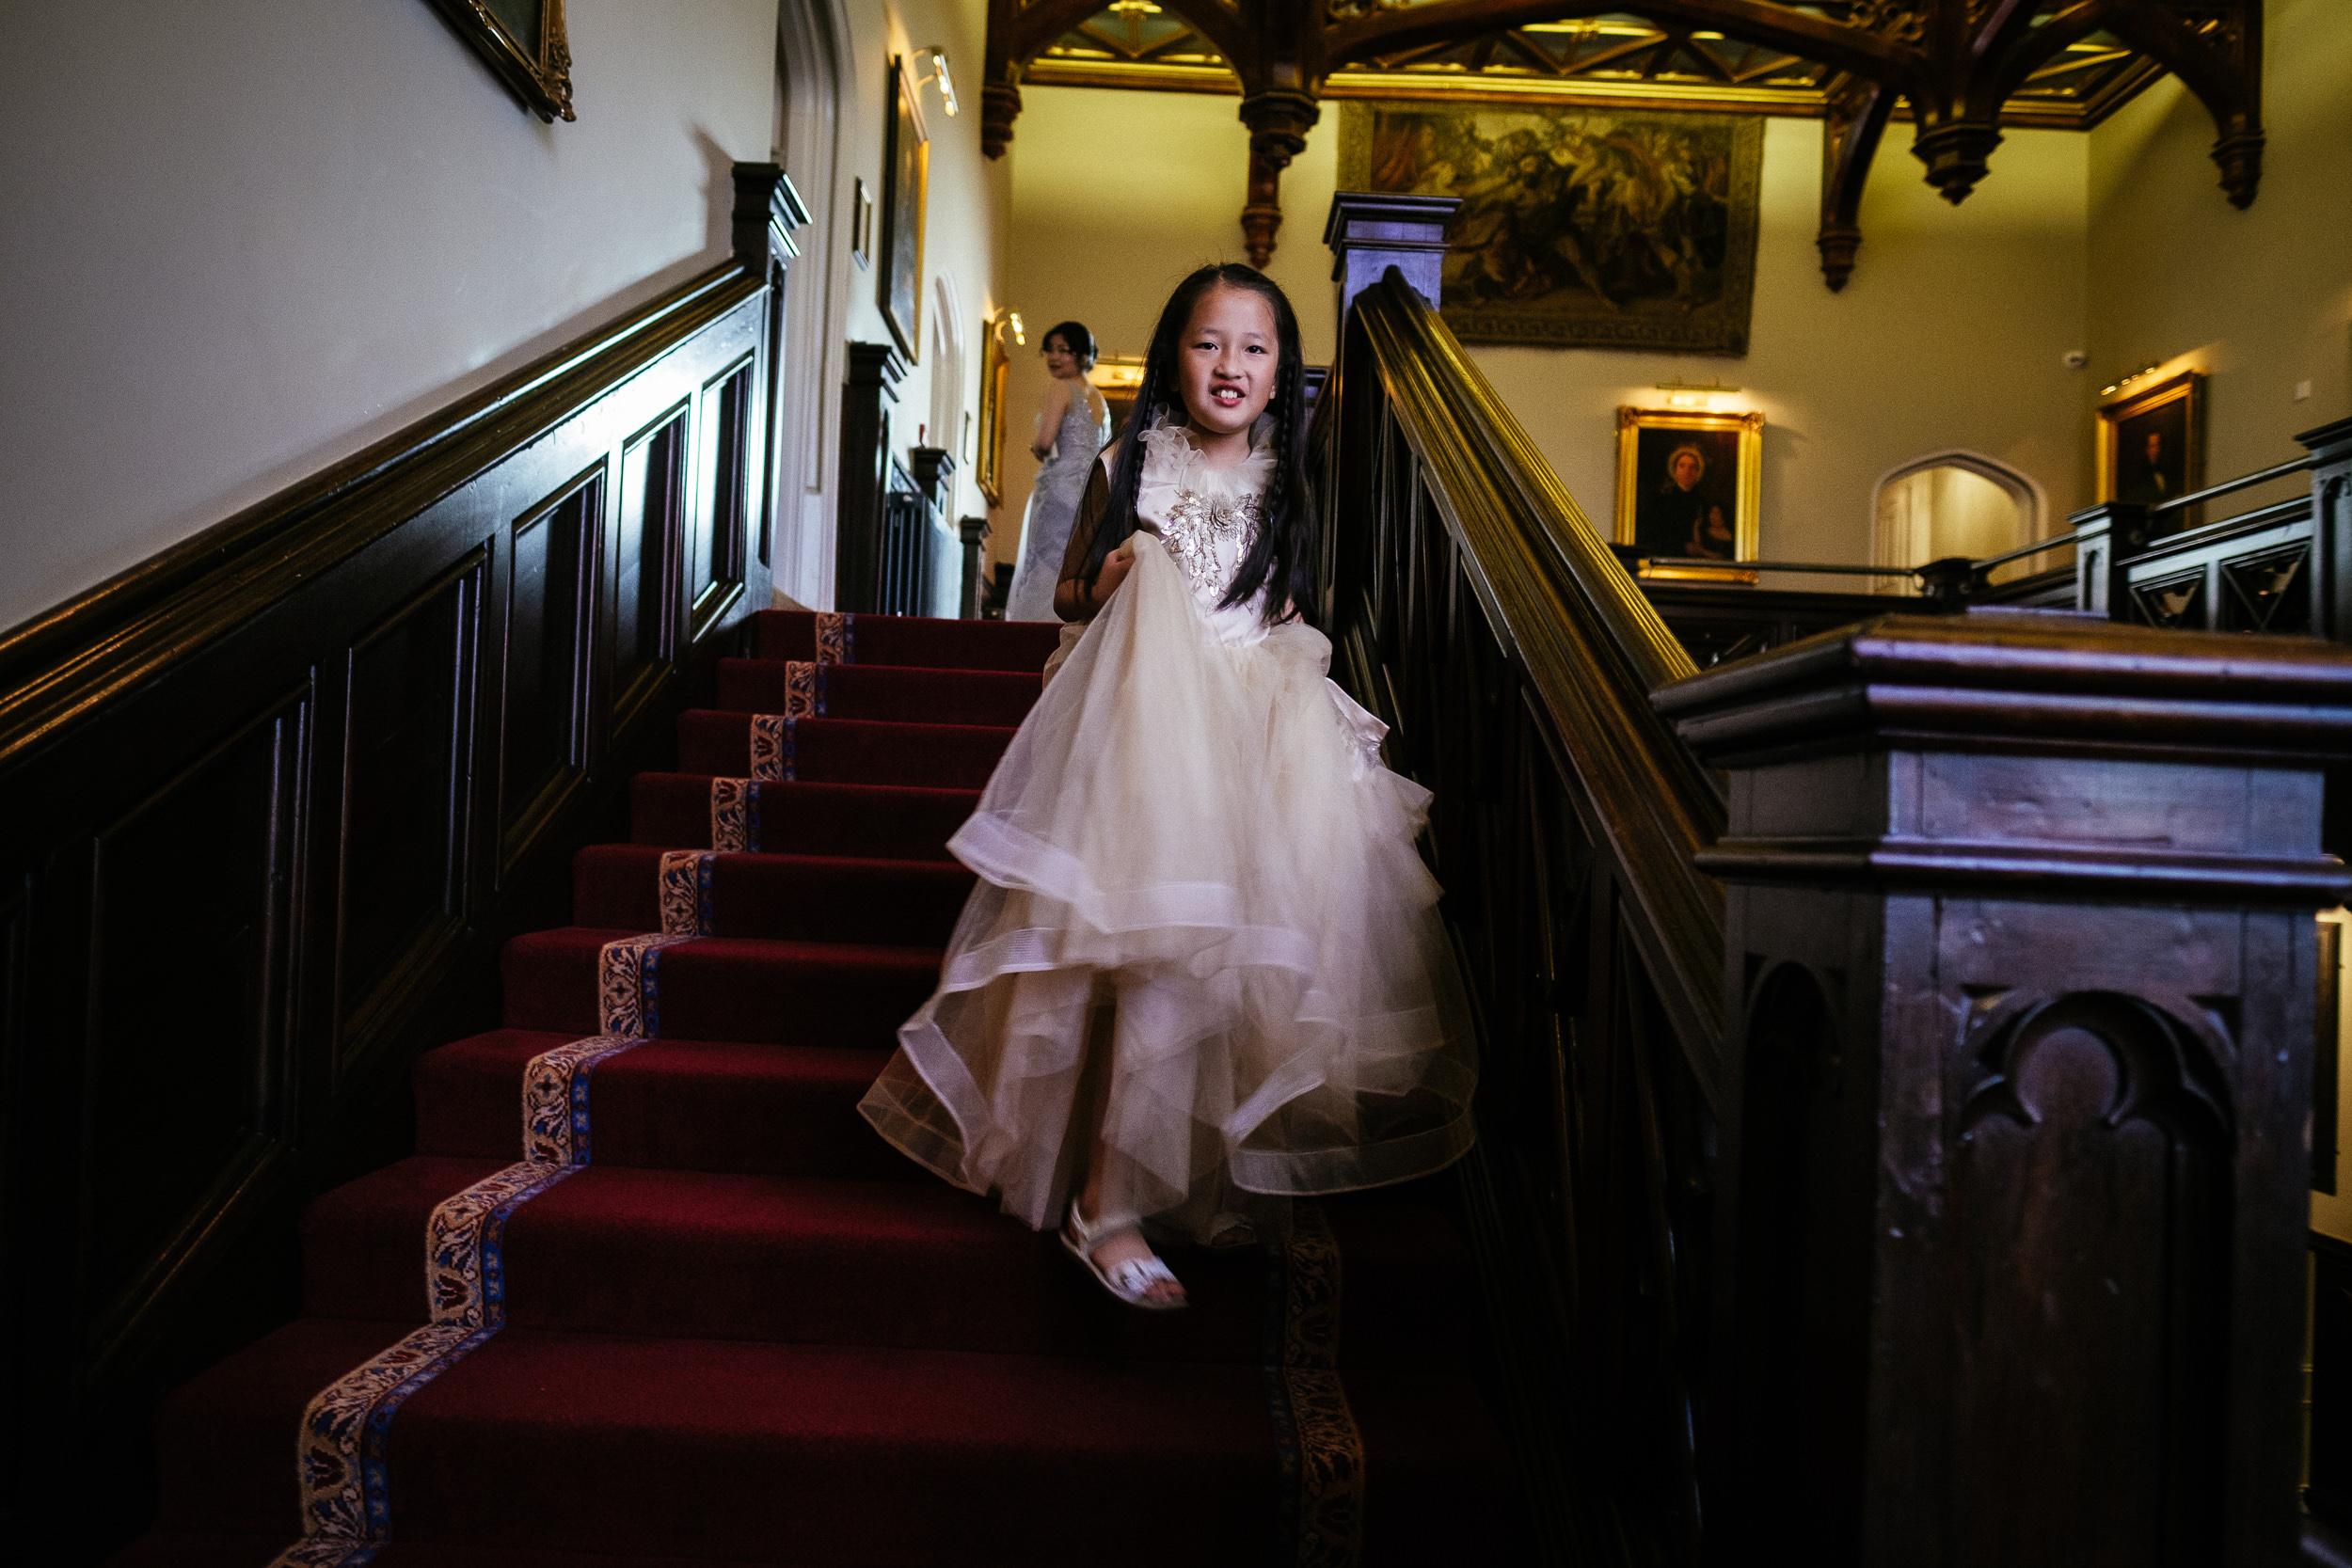 markree castle sligo Wedding Photographer 20